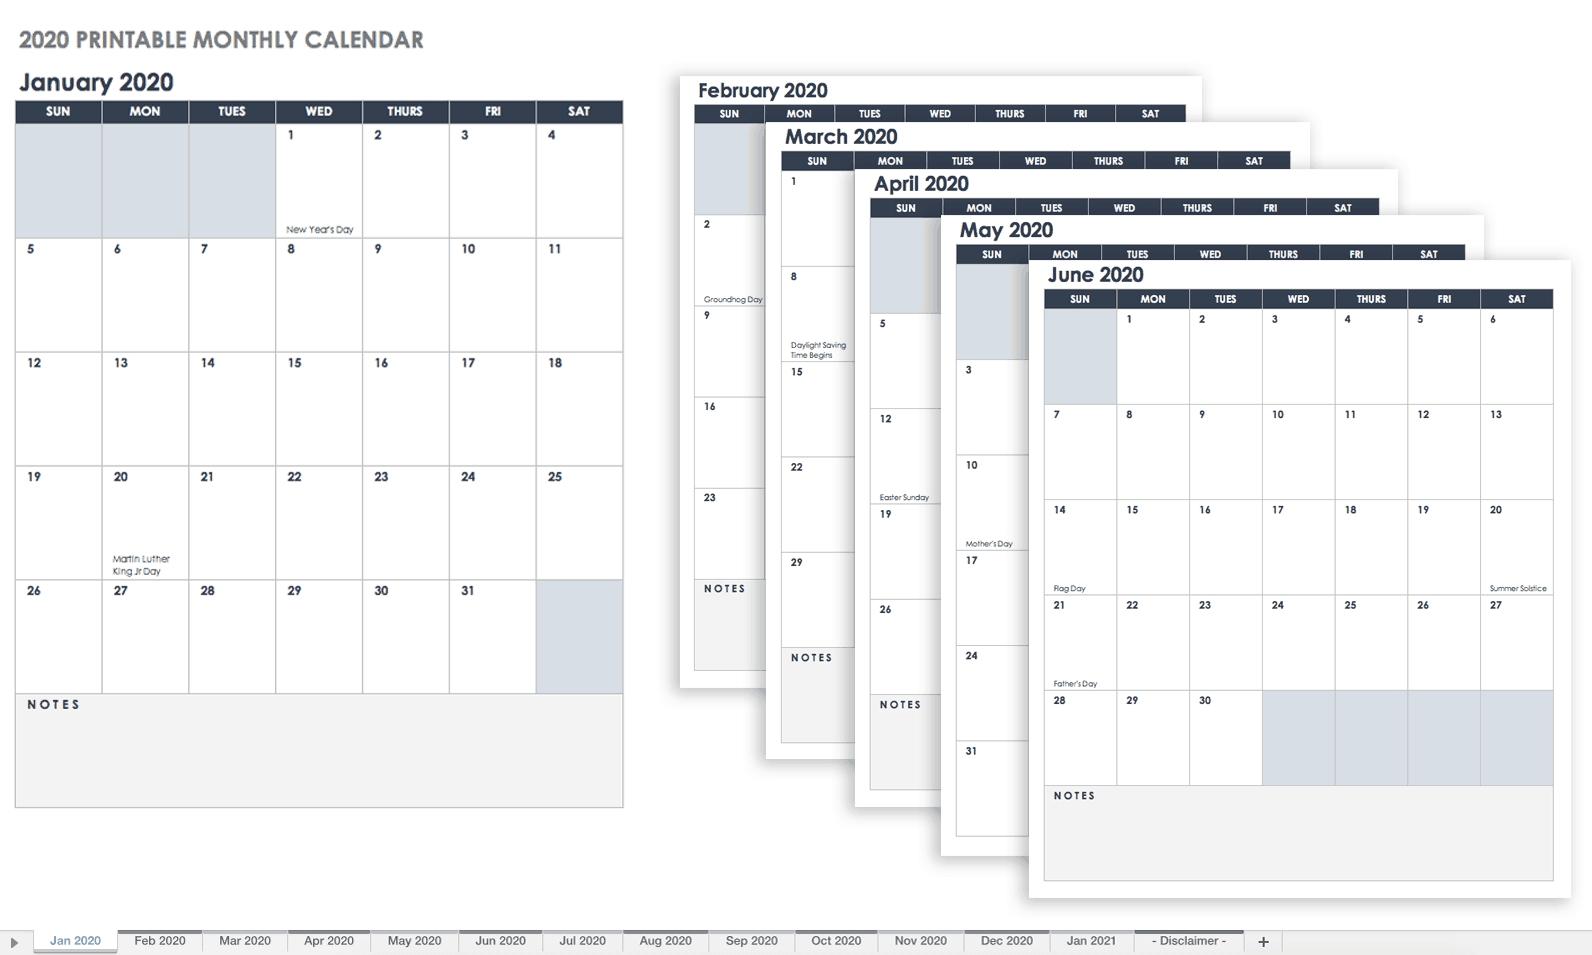 Free Blank Calendar Templates - Smartsheet intended for Blank Fill In Calendar 2020